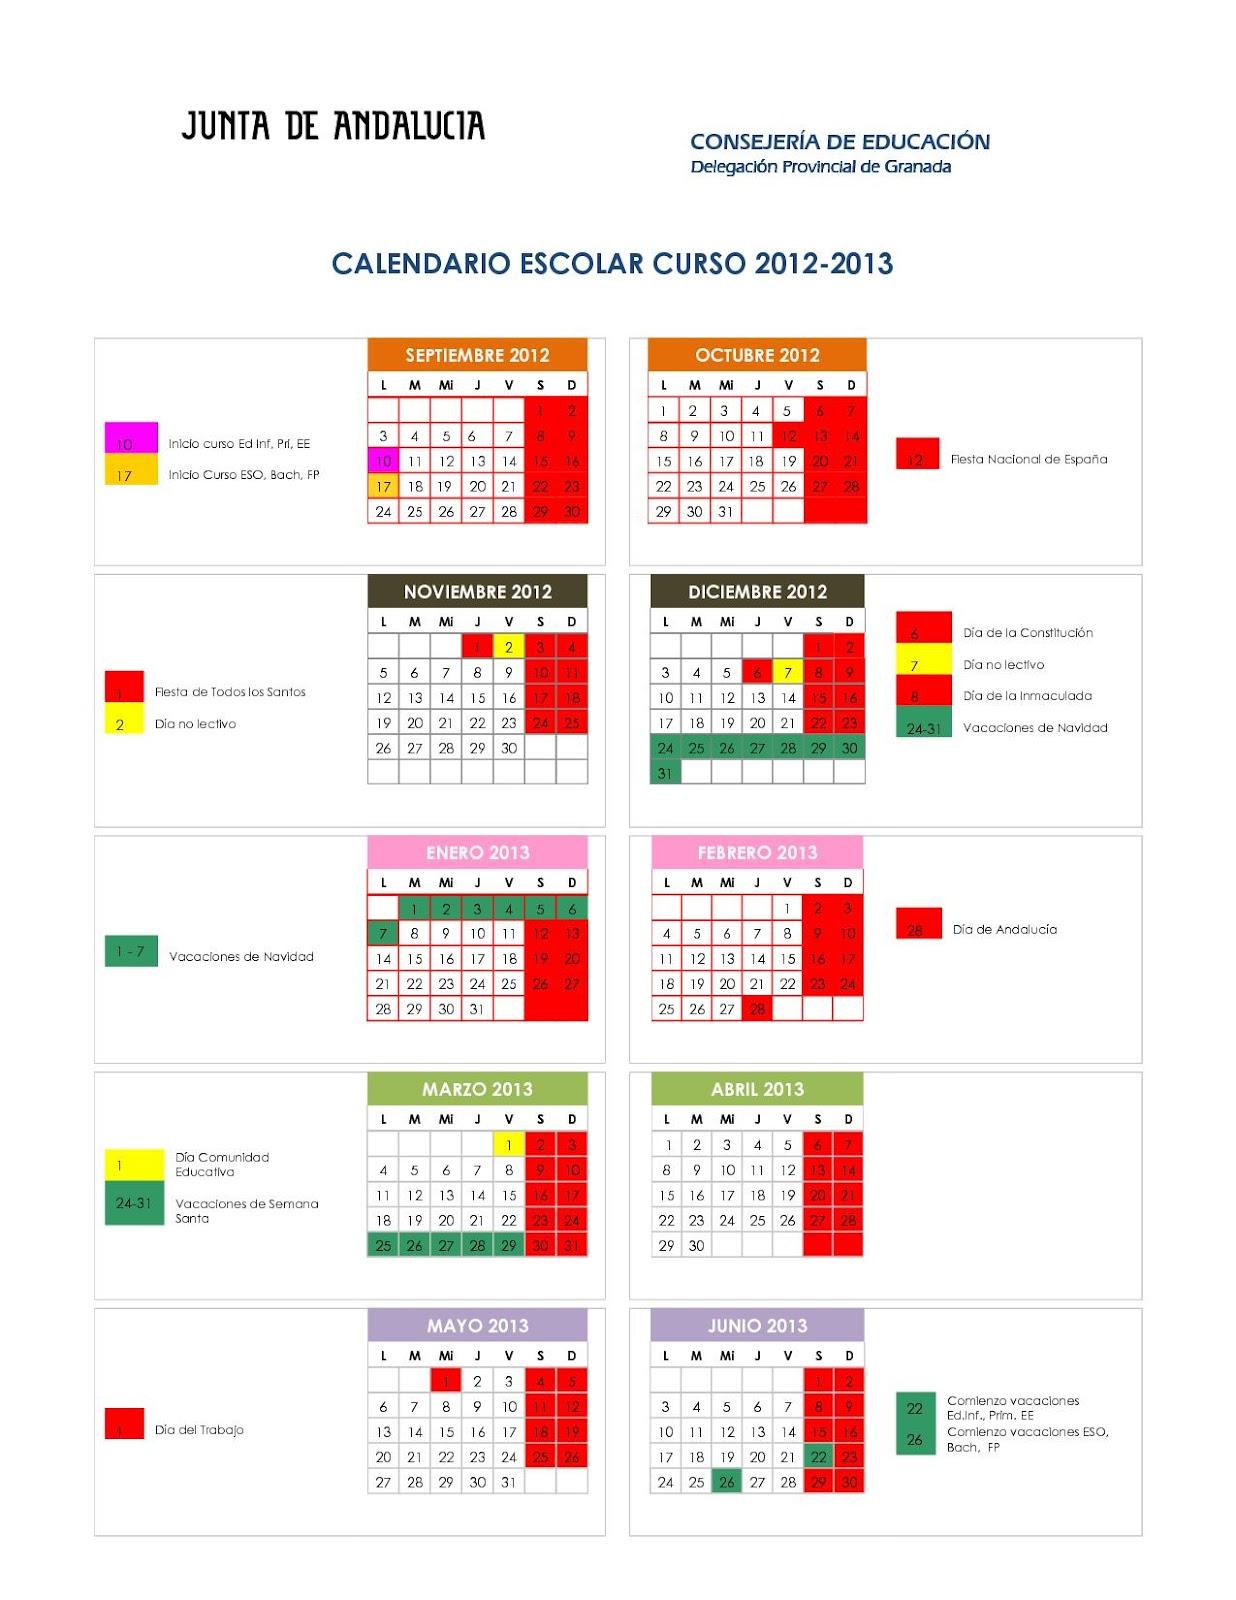 Calendario escolar 2012 13 junta de andaluc a el sexto nivel for Oficina junta de andalucia